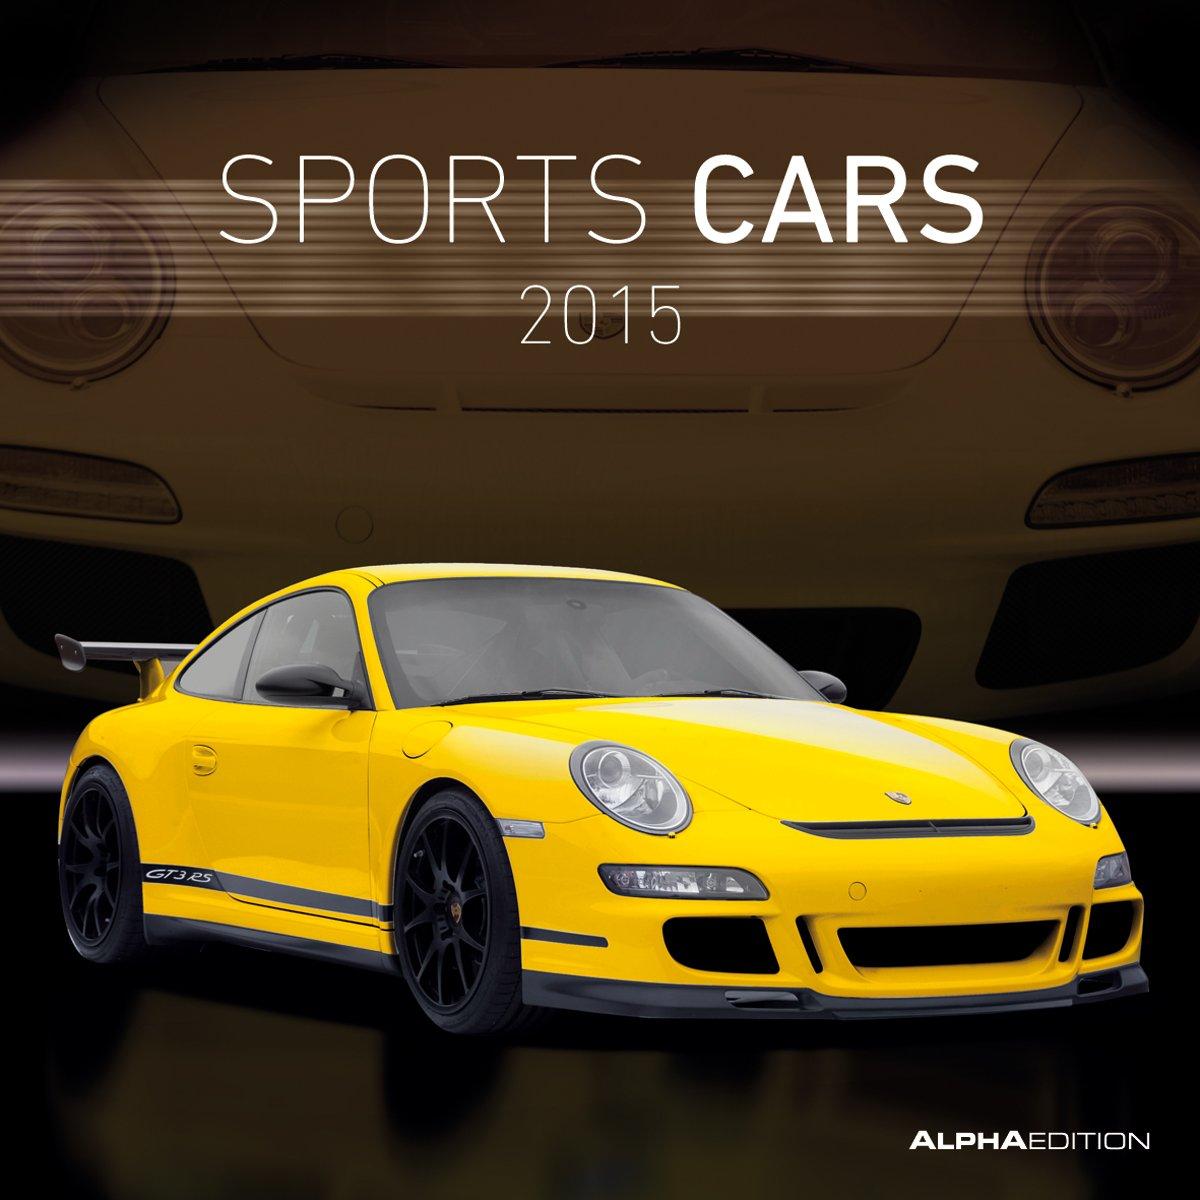 Sports Cars 2015 - Autokalender/Broschürenkalender (30 x 60 geöffnet) - Sportwagen